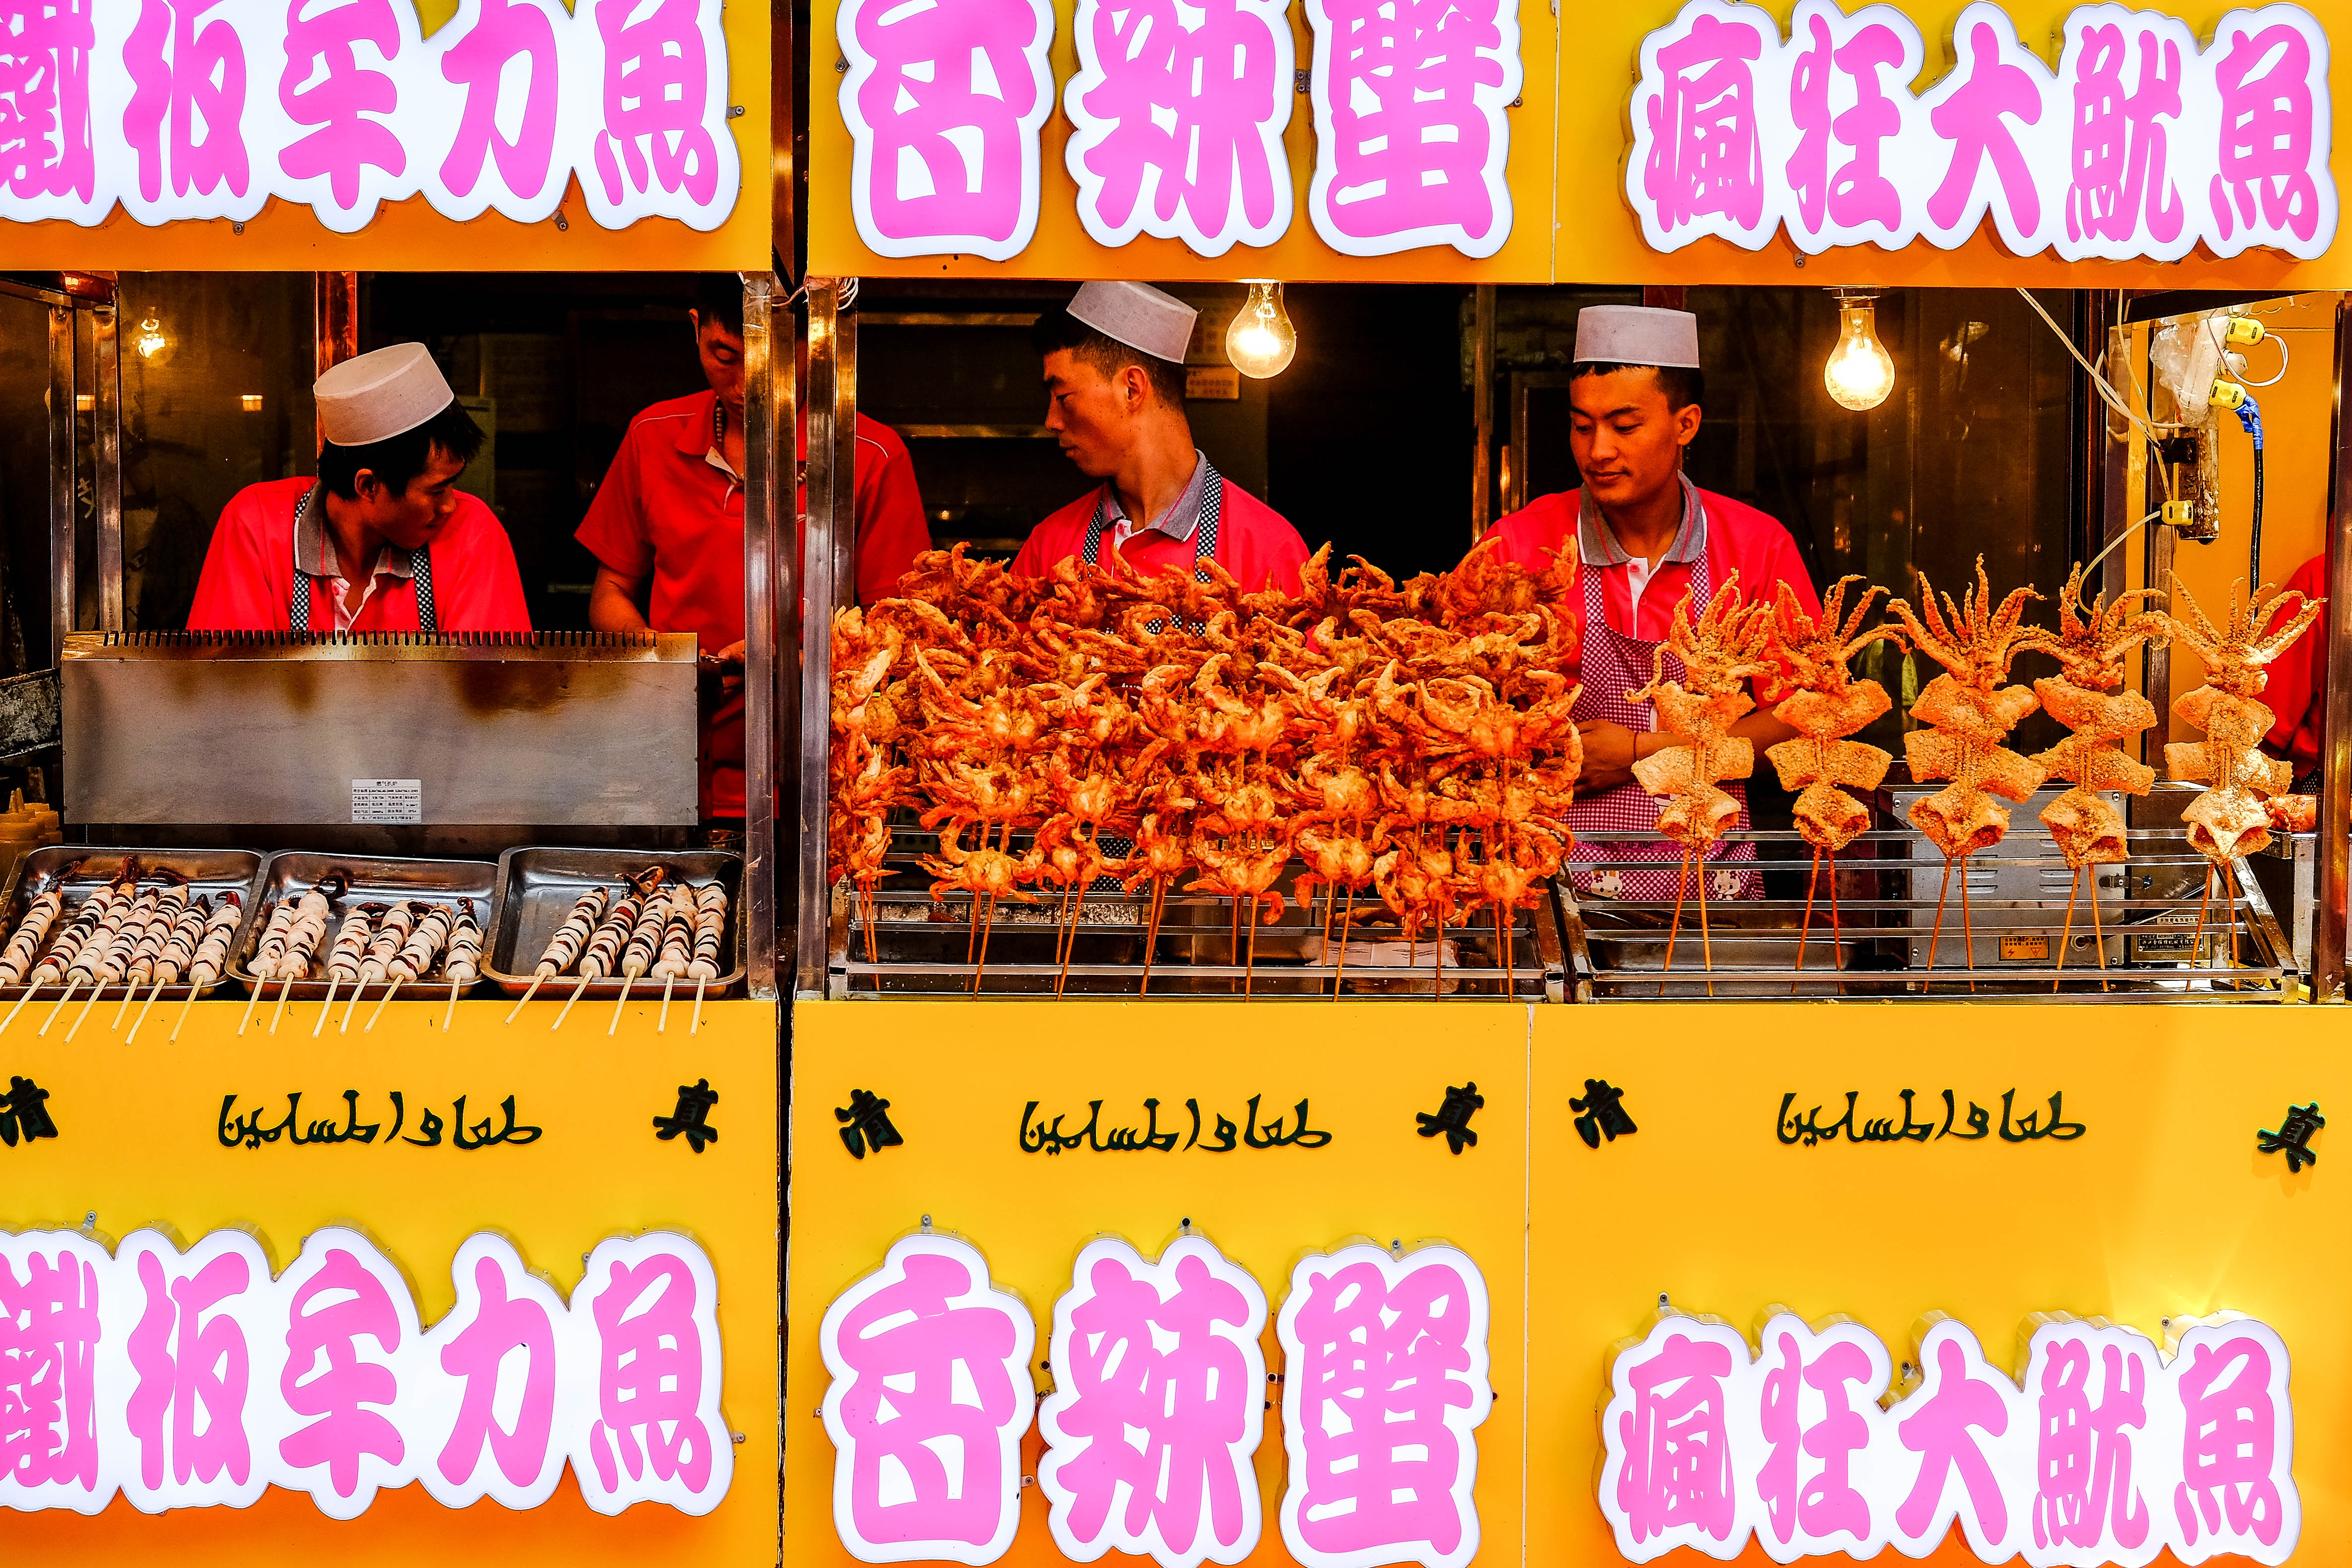 Stand de crabes et calamars frits à Xi'an, en Chine.